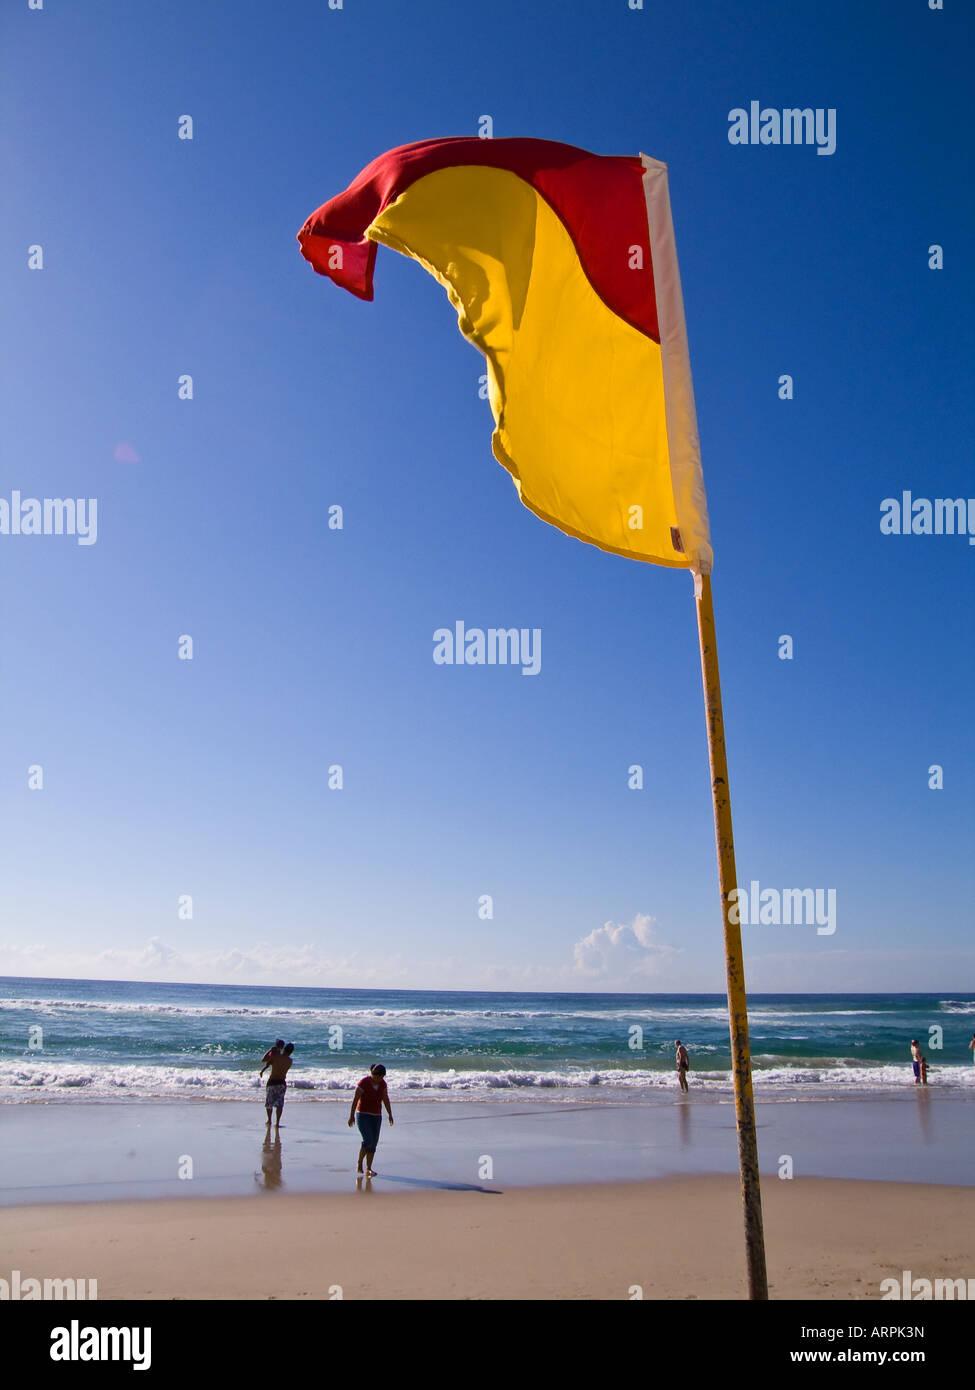 Surf Life Saving flag Gold Coast Queensland Australia - Stock Image